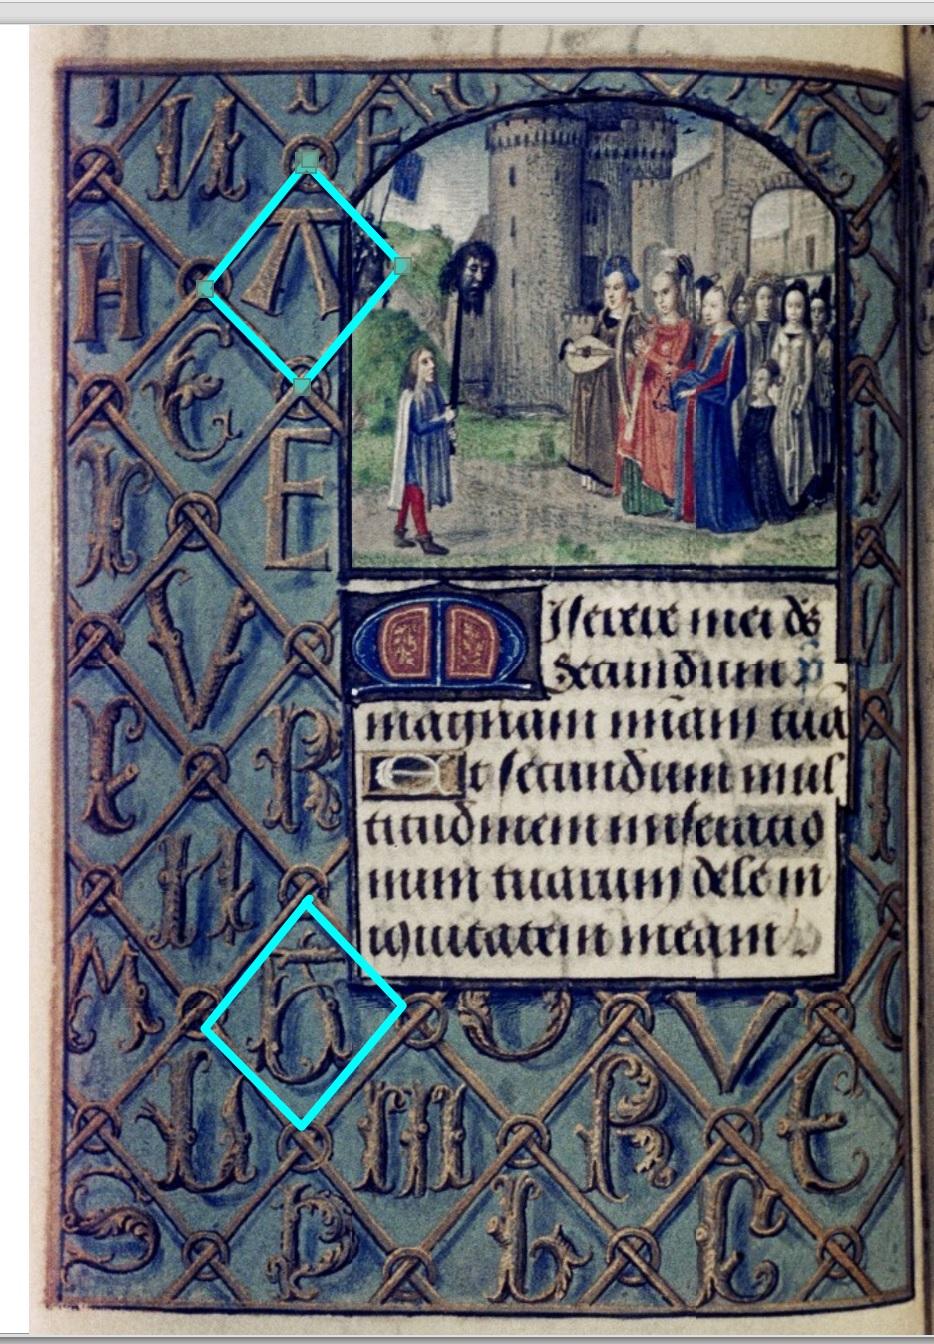 1475 ca Master of Mary of Burgundy Hours of Engelbert of Nassau Bodleian Library MS. Douce 220 fol 190v David avec la tete de Goliath schema